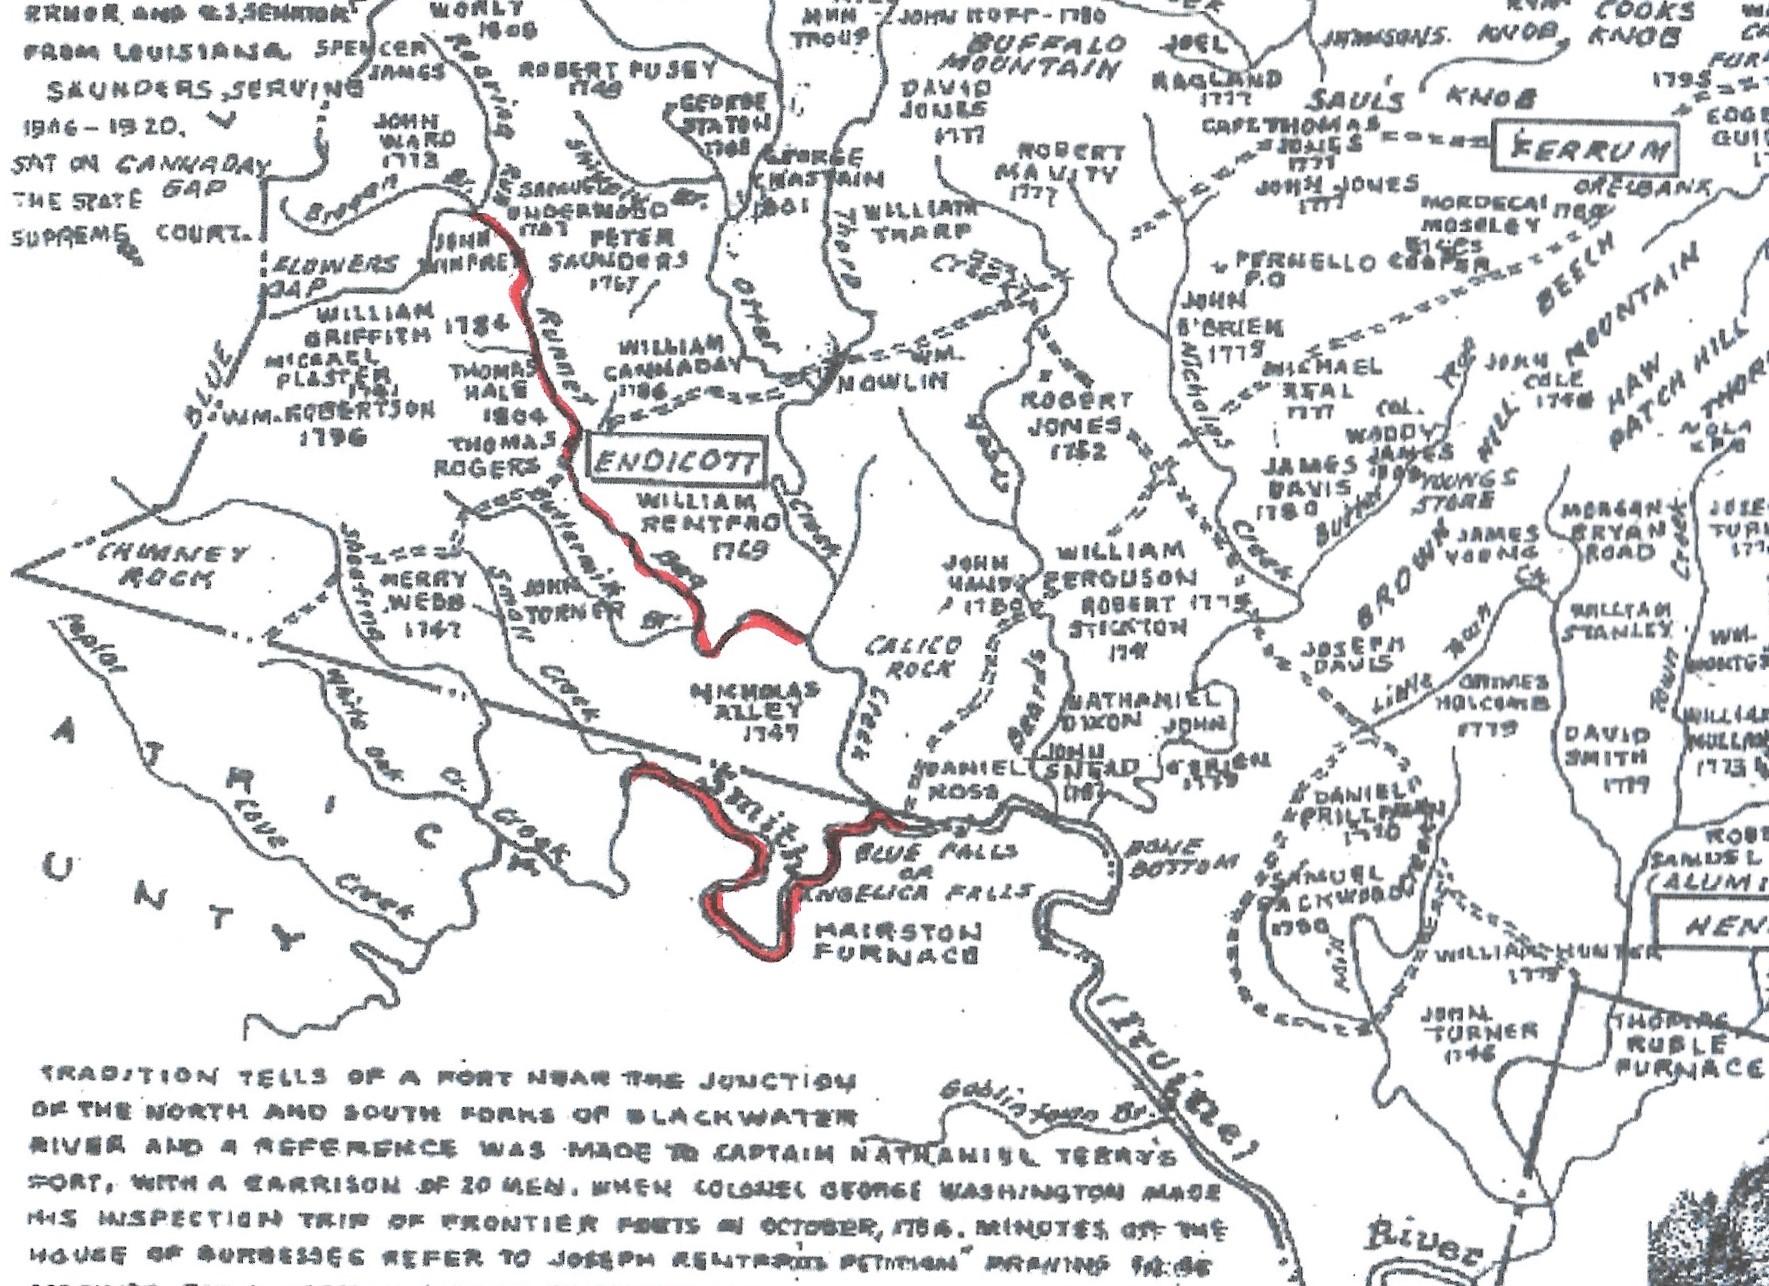 James, Spencer, map of land 001